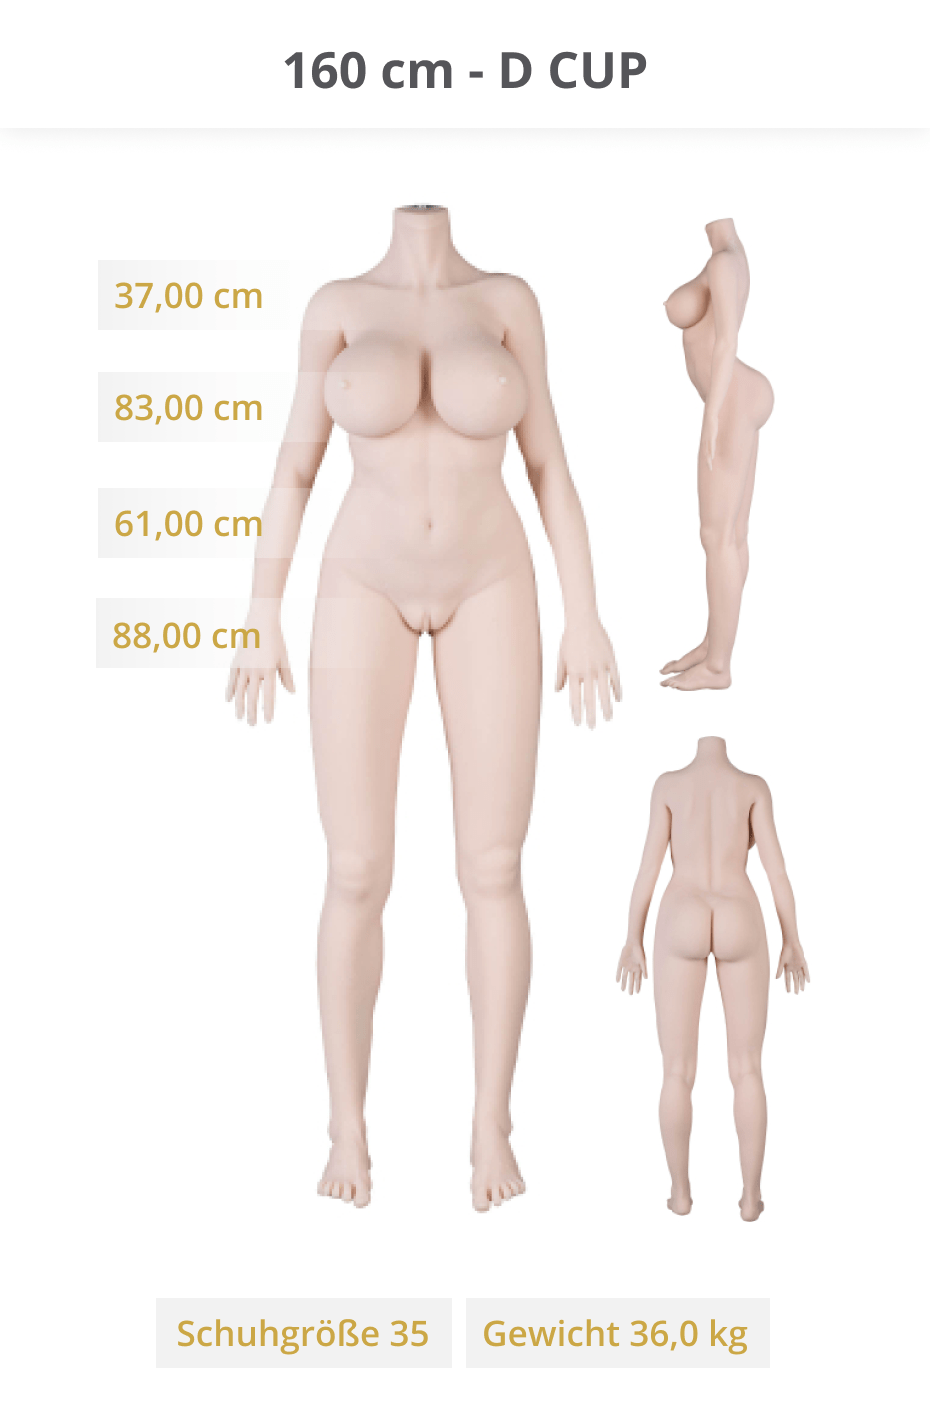 6ye-Dolls-160-cm-D-CUP